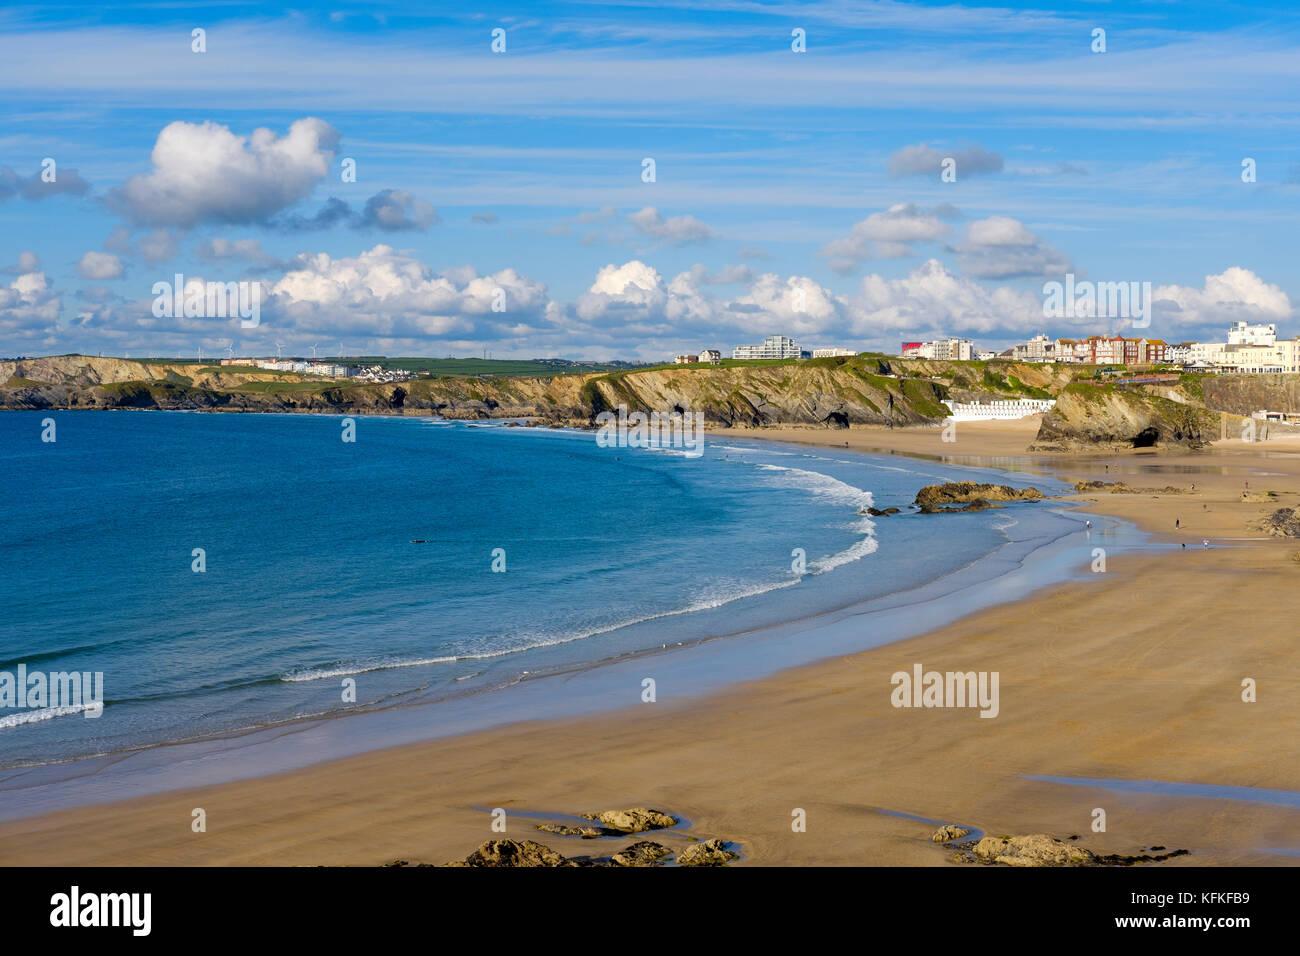 Great Western Beach and Towan Beach, Newquay, Cornwall, England, Great Britain - Stock Image